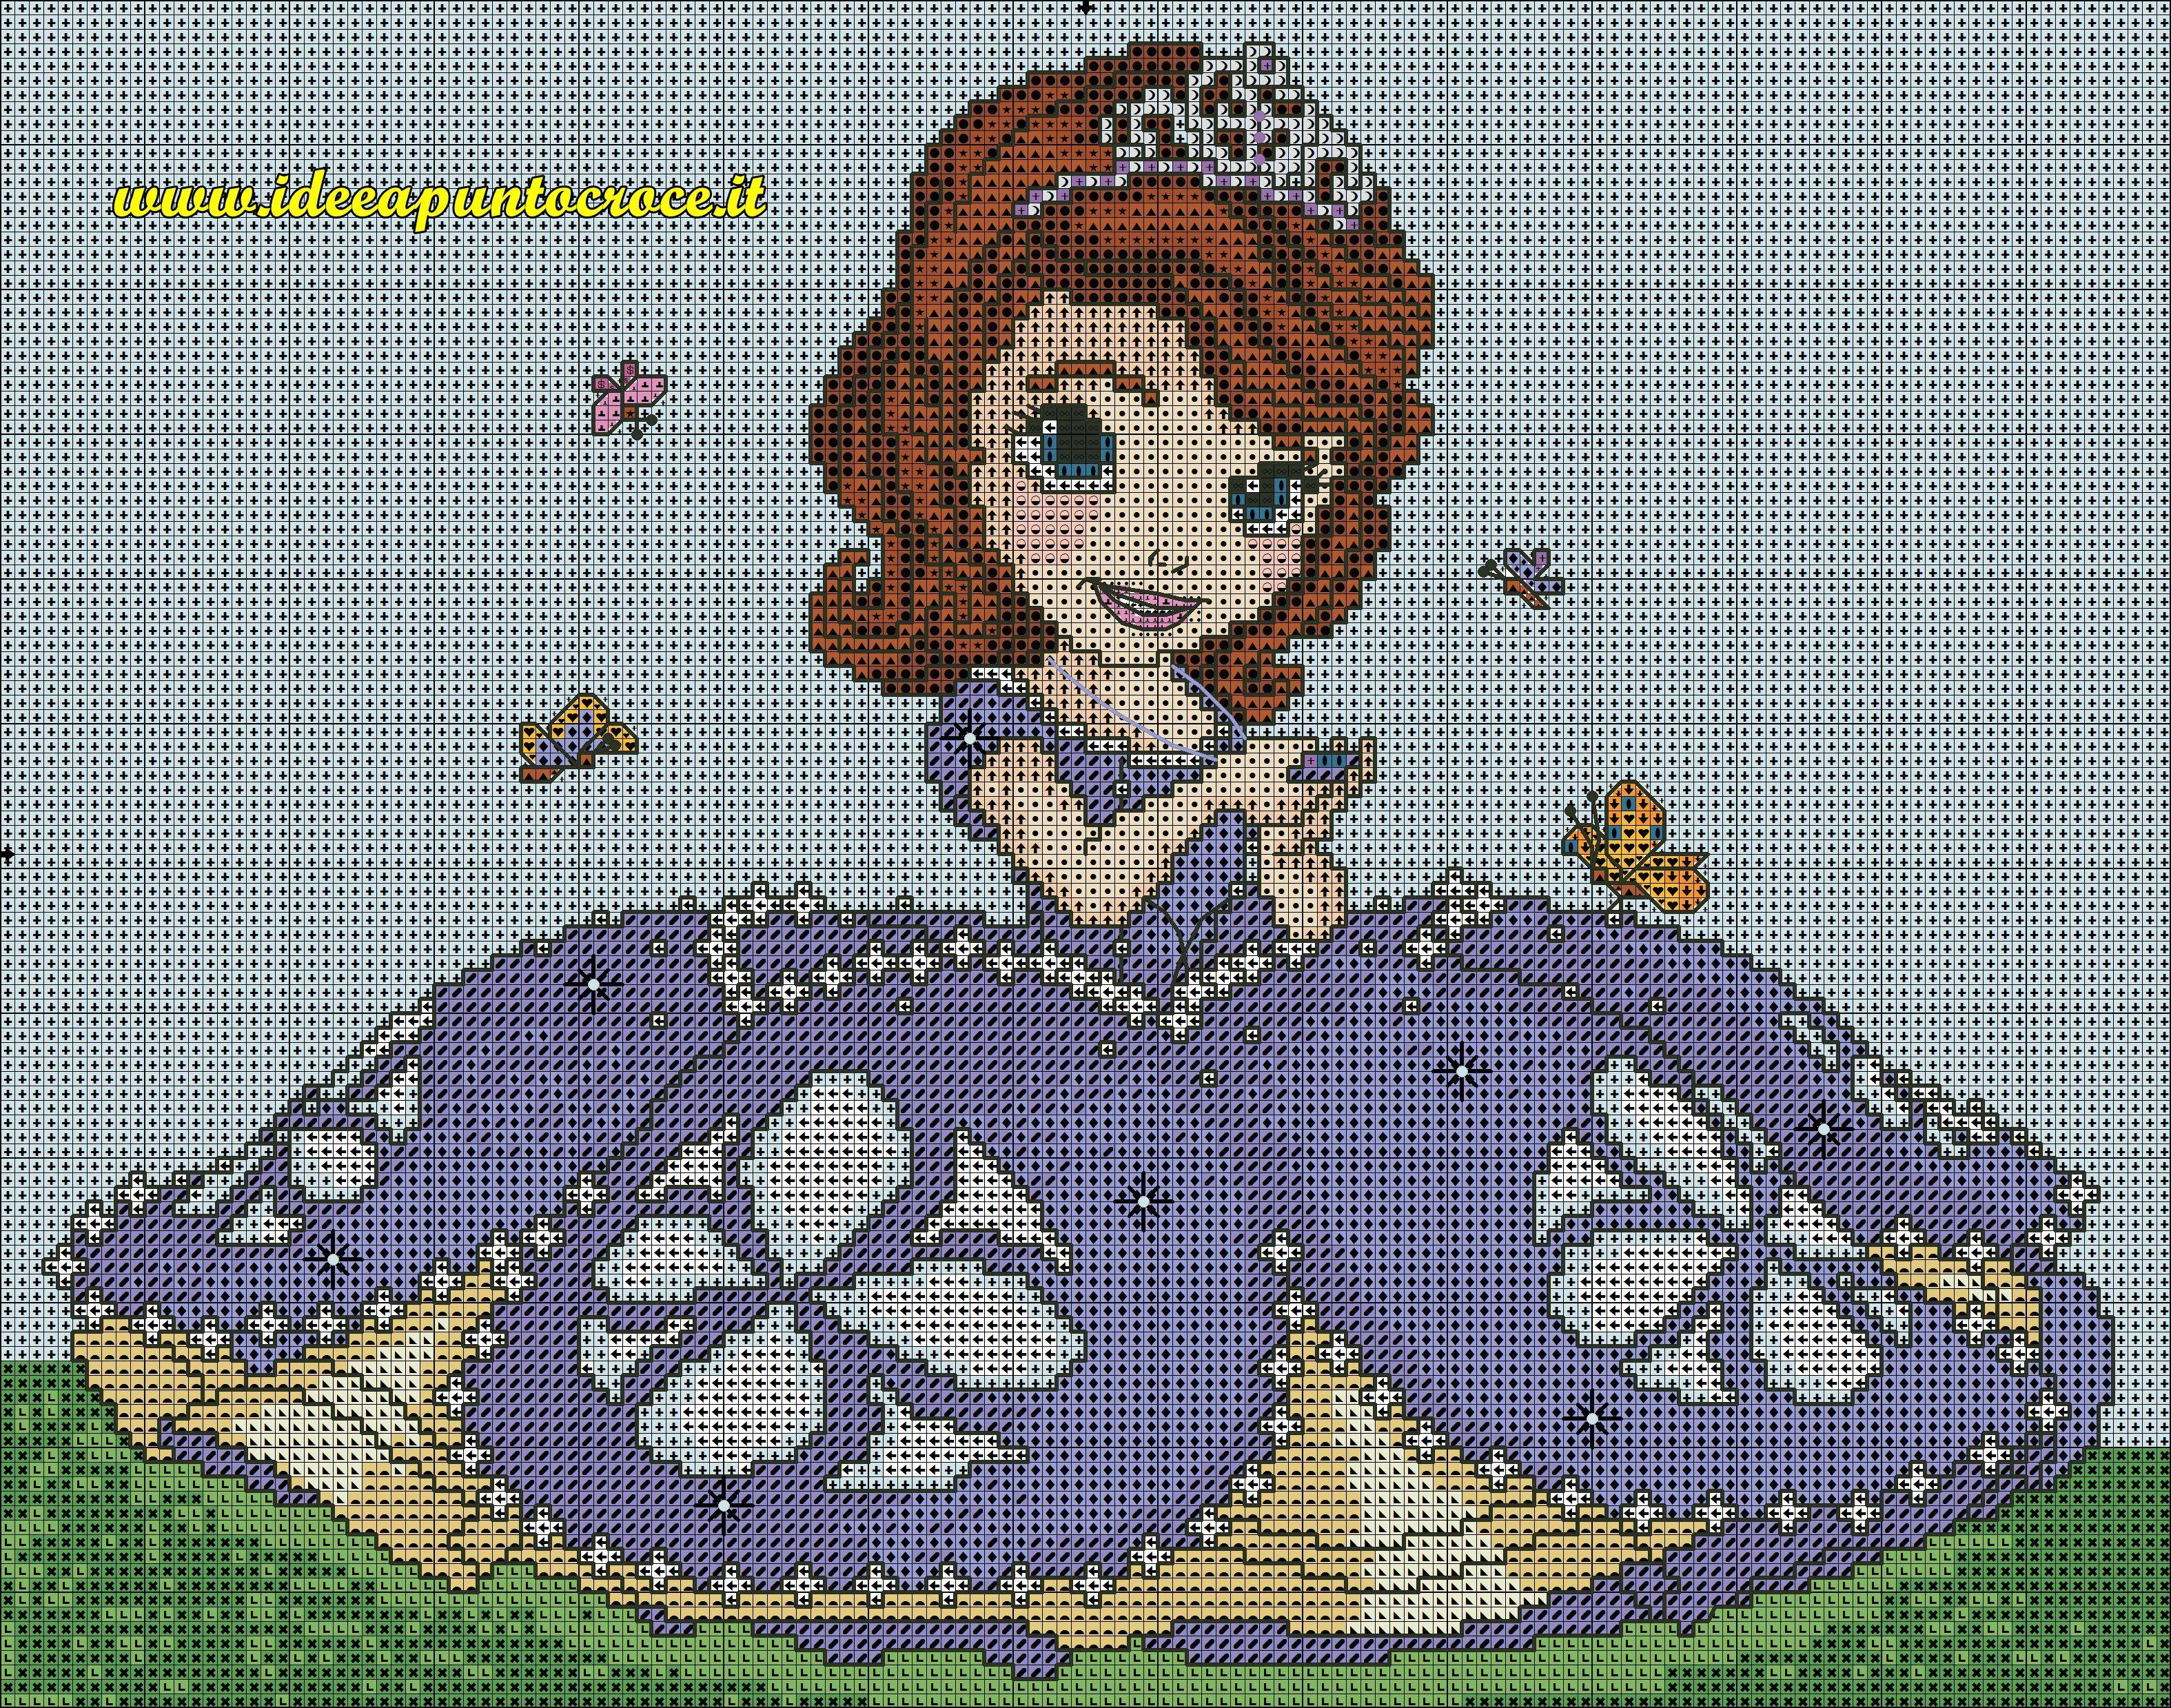 Schema Principessa Sofia Punto Croce Punto De Cruz Disney Hada De Punto De Cruz Estuches De Punto De Cruz